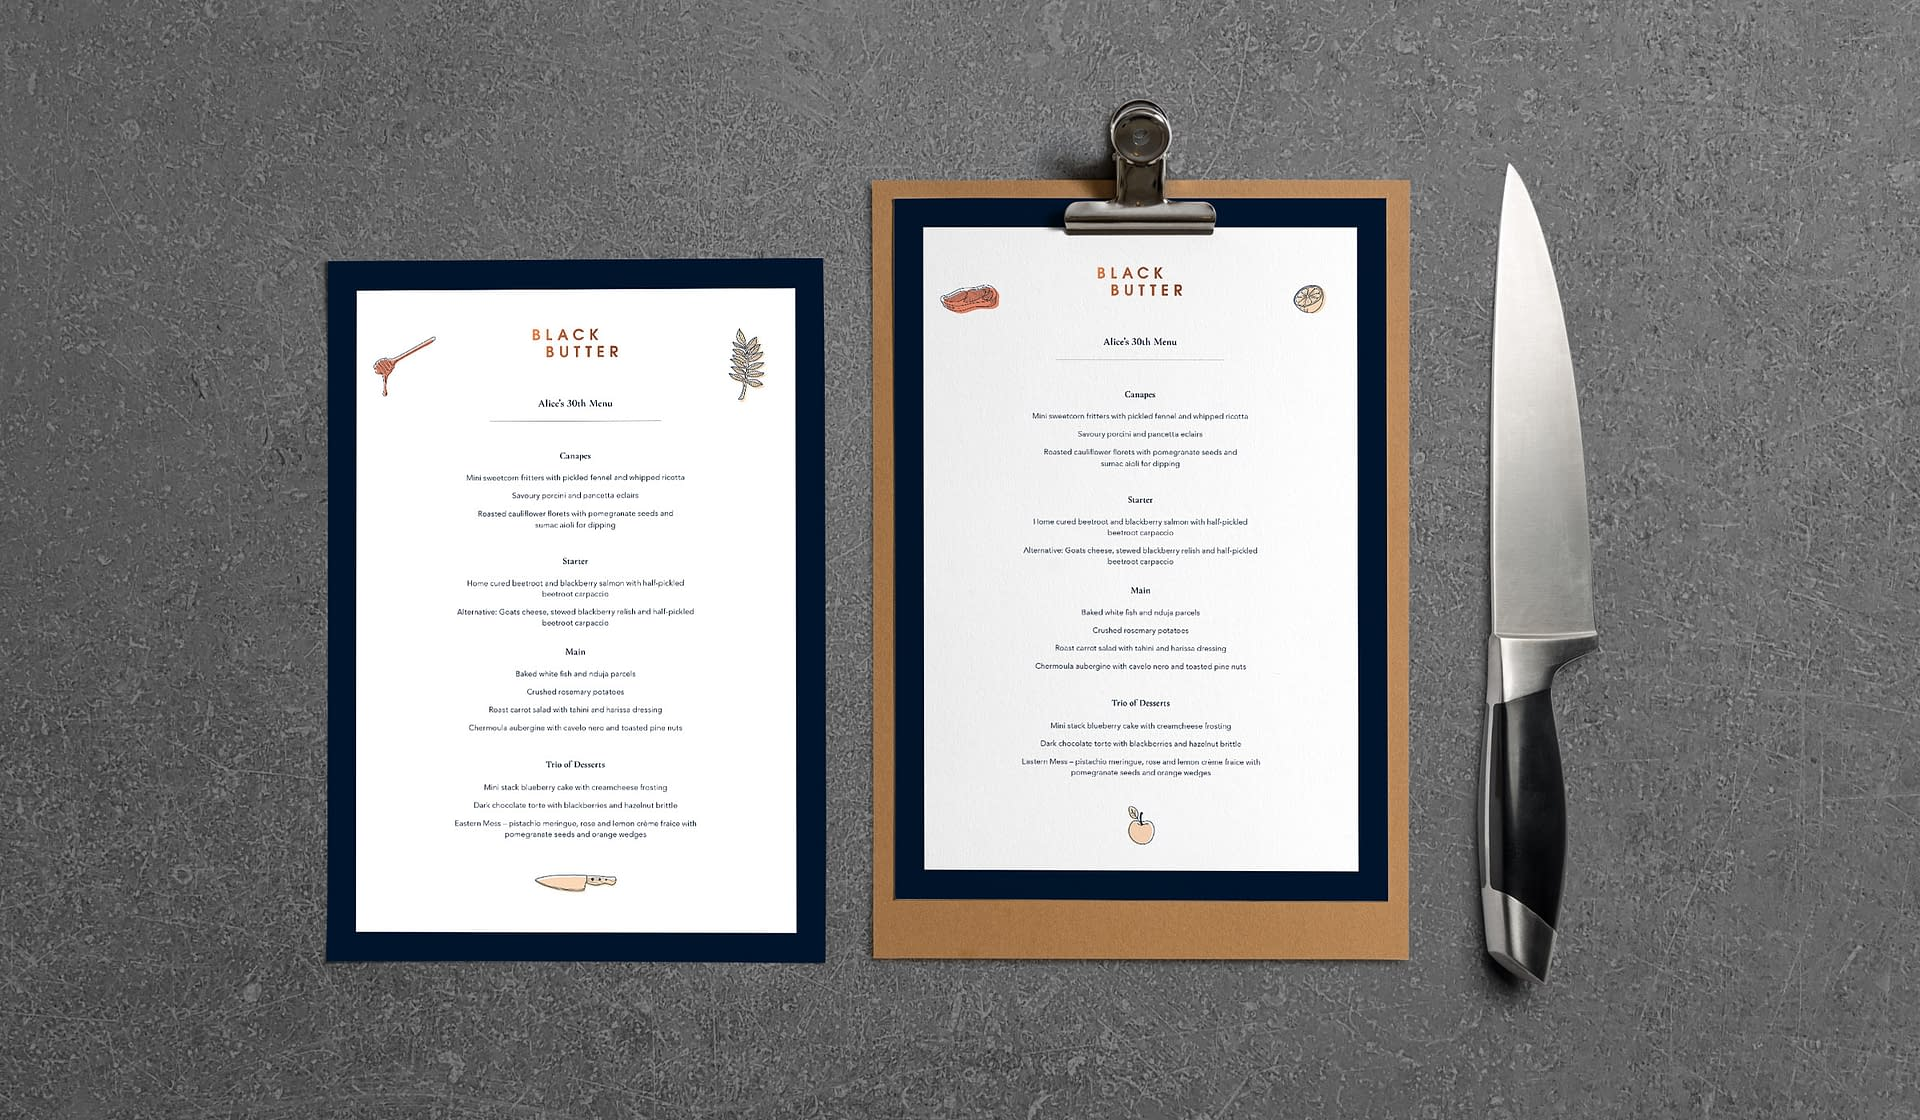 Black Butter menus